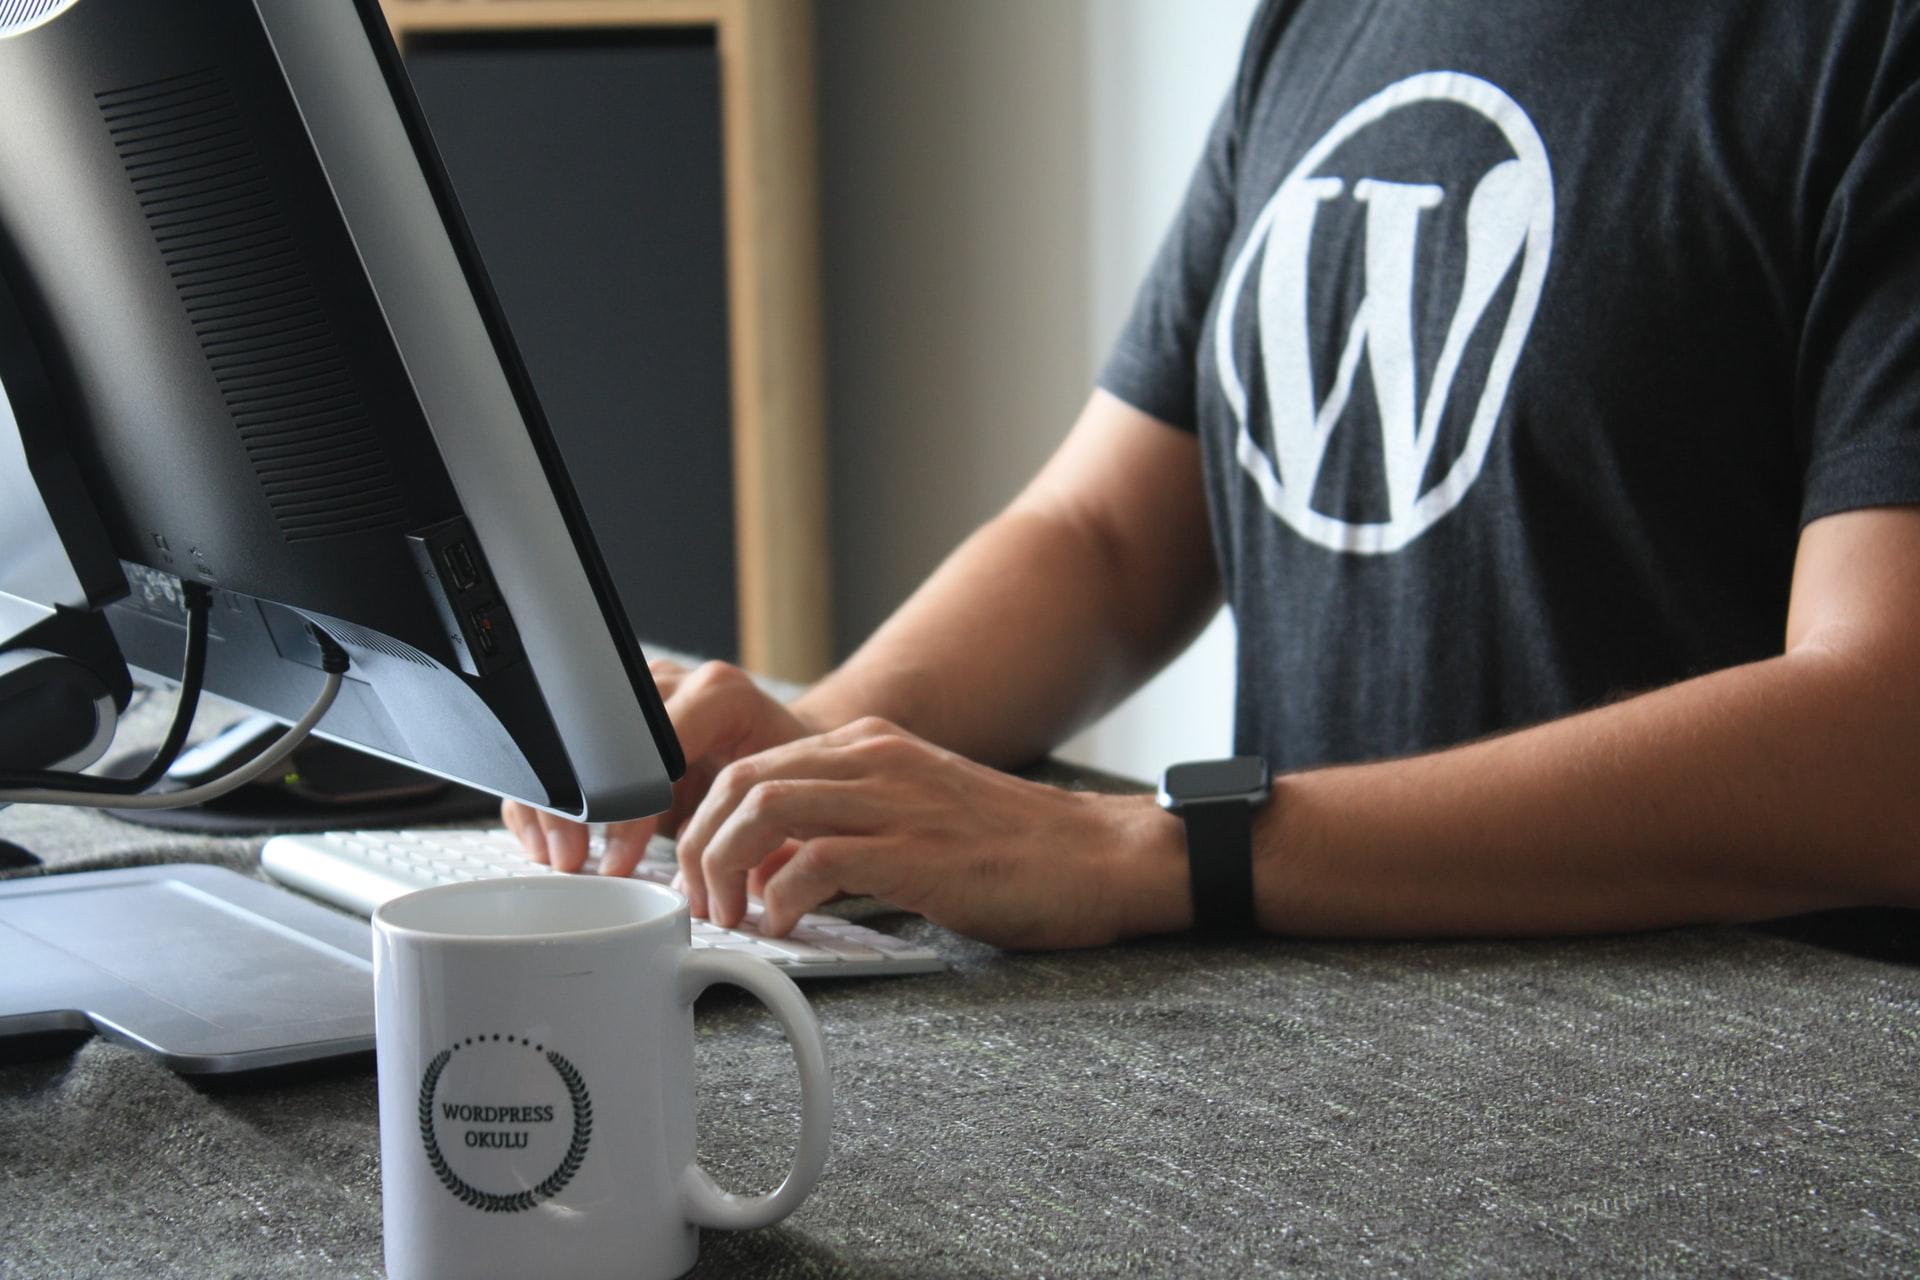 7 Essential WordPress Plugins From 2020 That Echo Into 2021 - WordPress Plugins